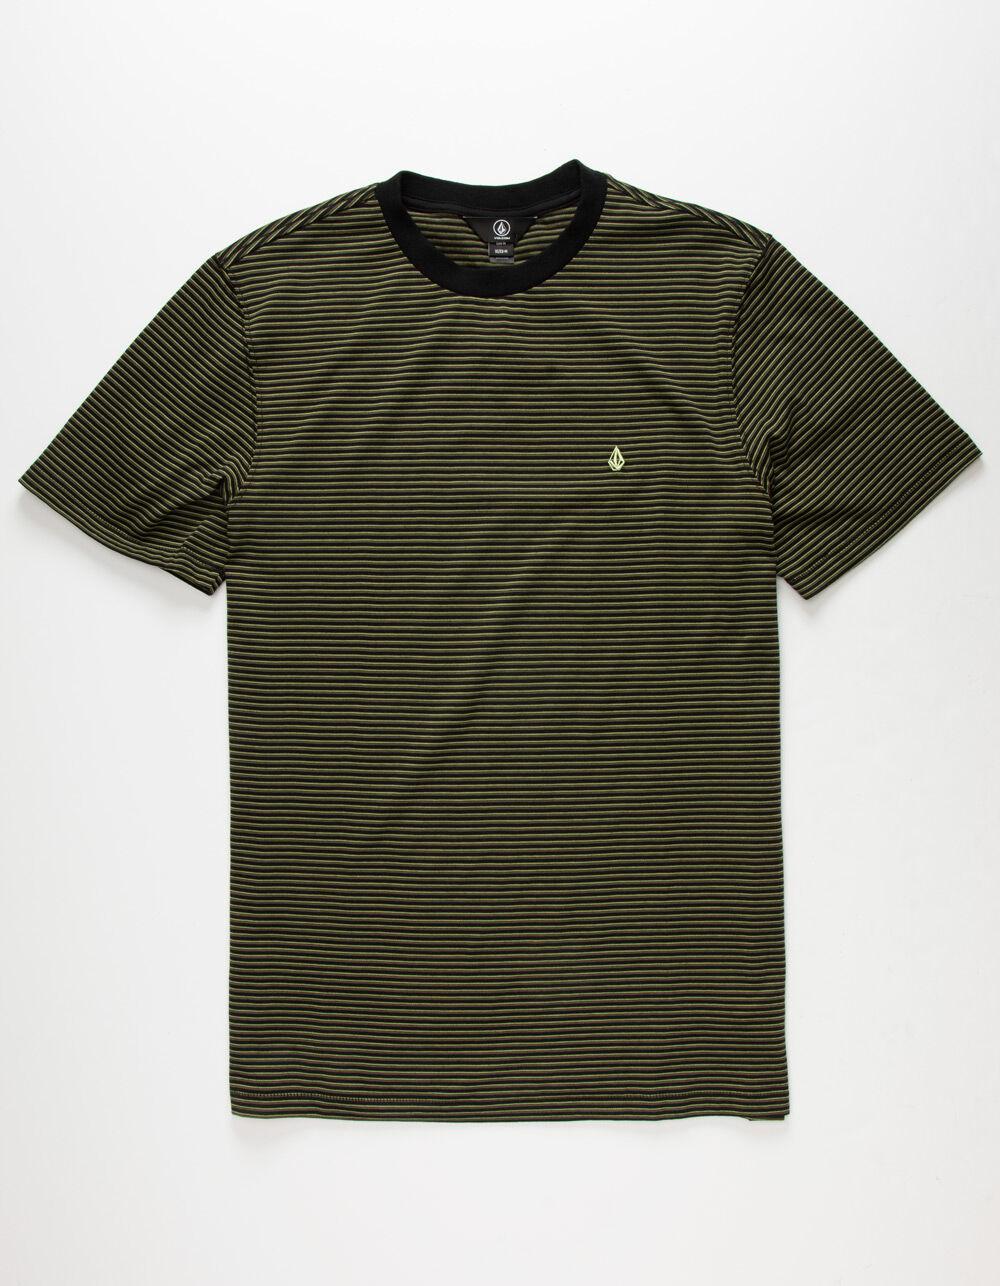 VOLCOM Thorne T-Shirt